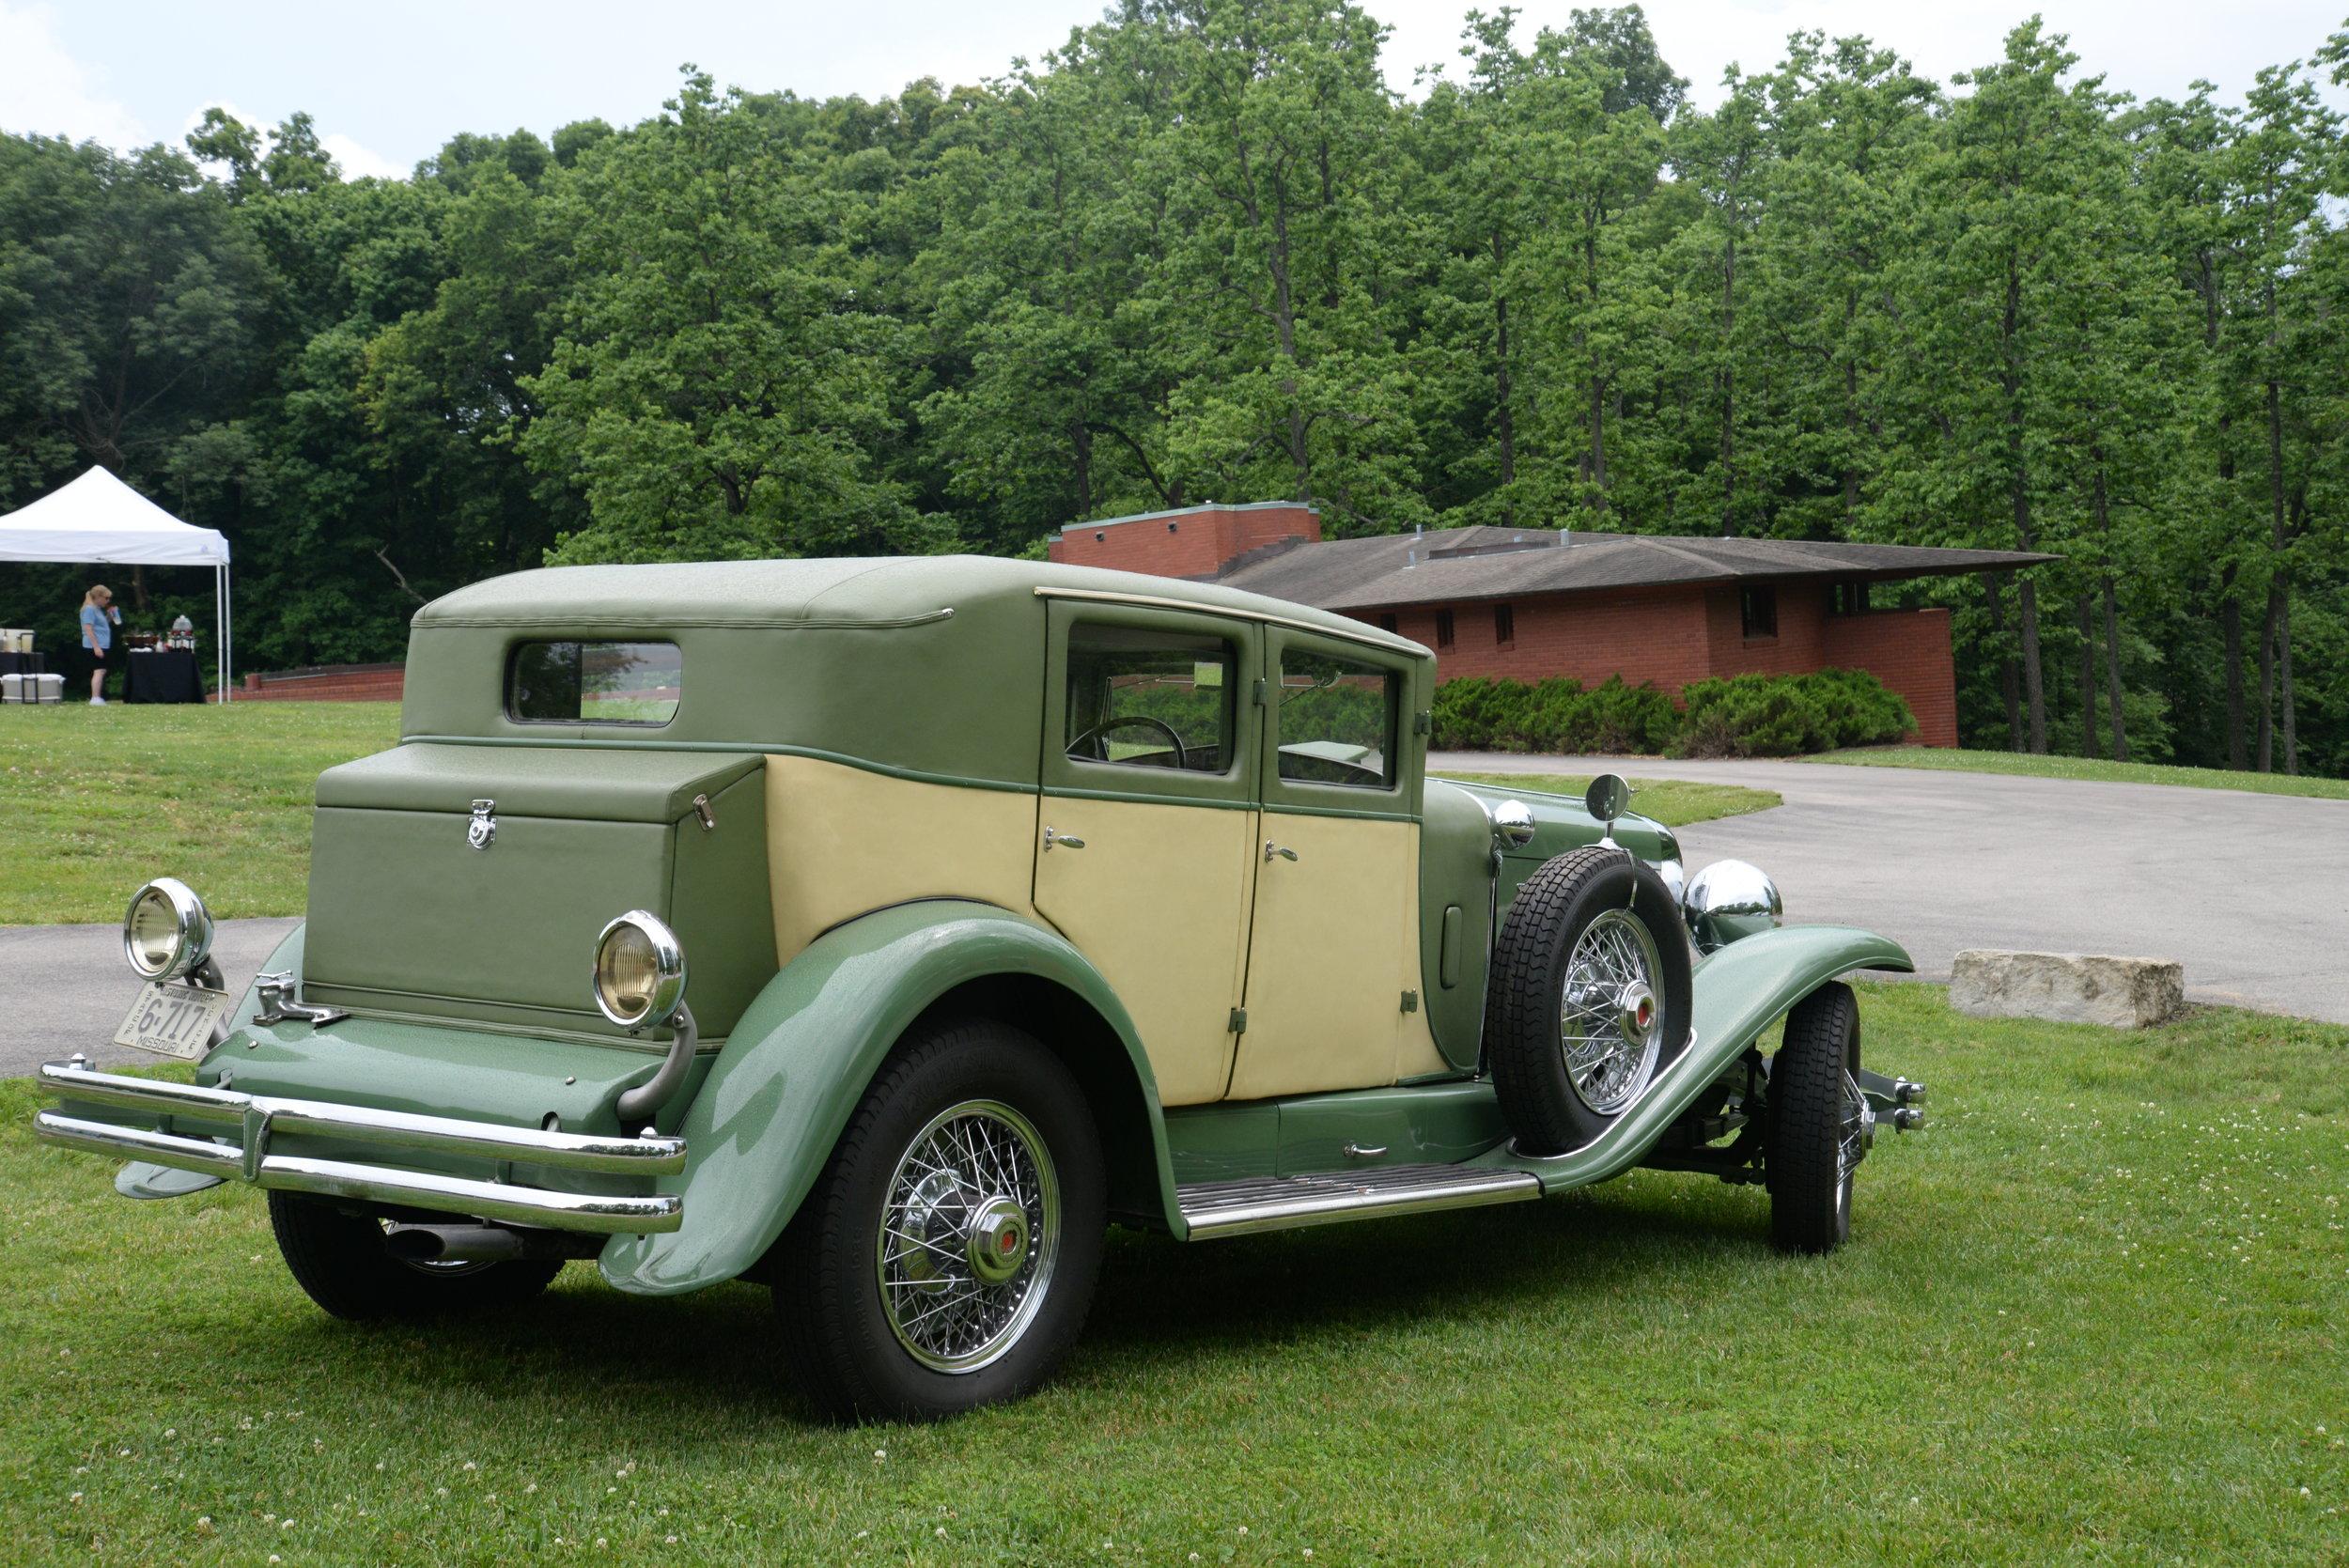 Richard Quick's 1929 Duesenberg J Sedan - stunning at any angle!